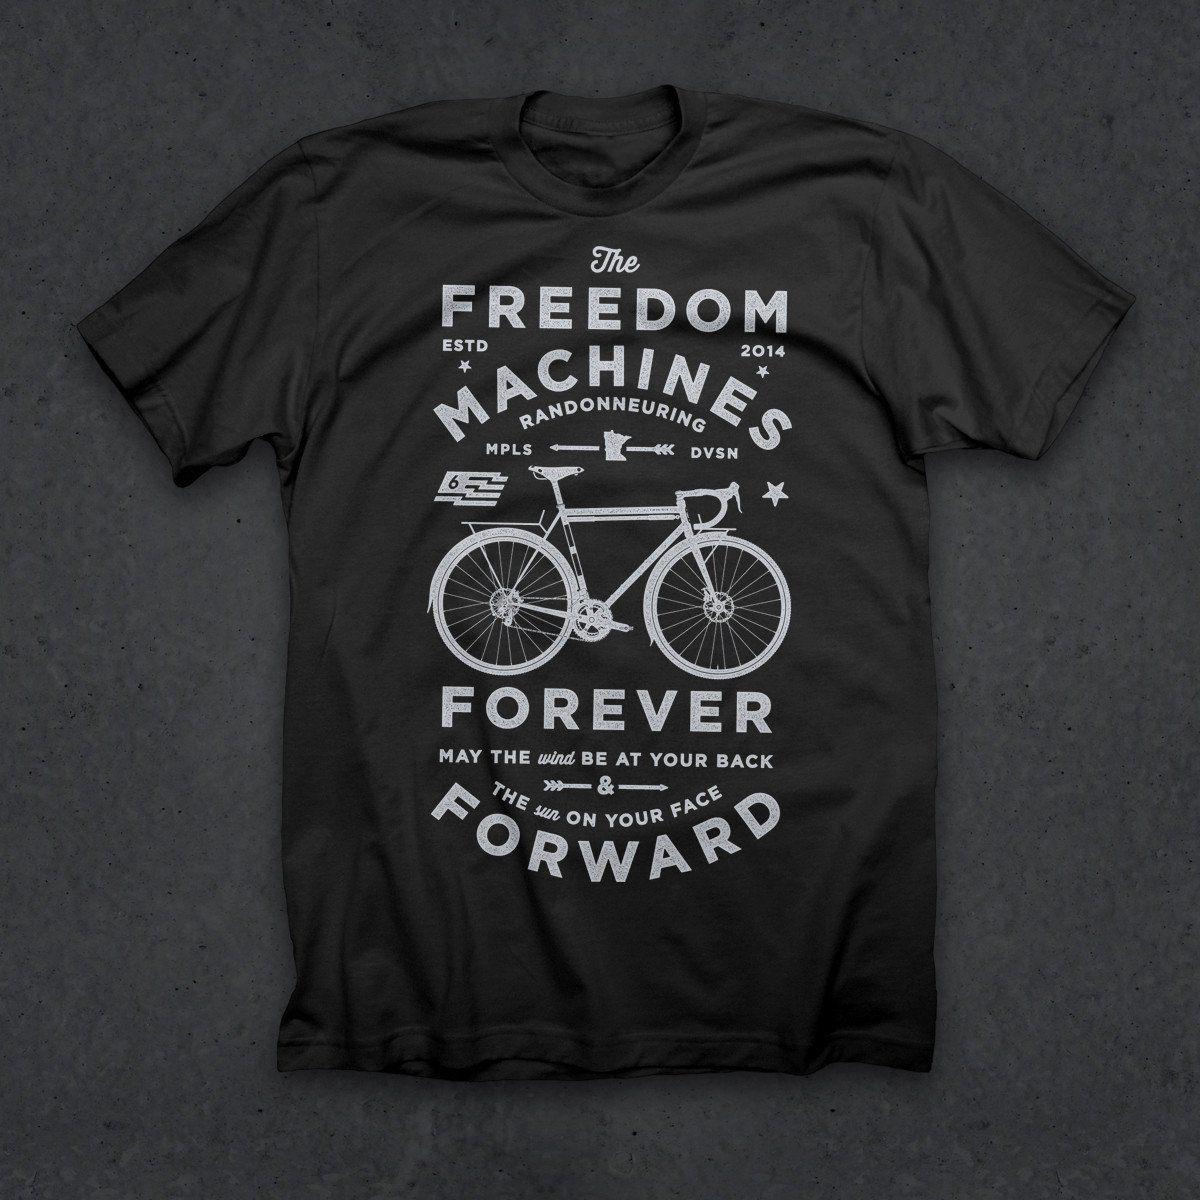 DHDWear MTB Trooper T-Shirt Large Black